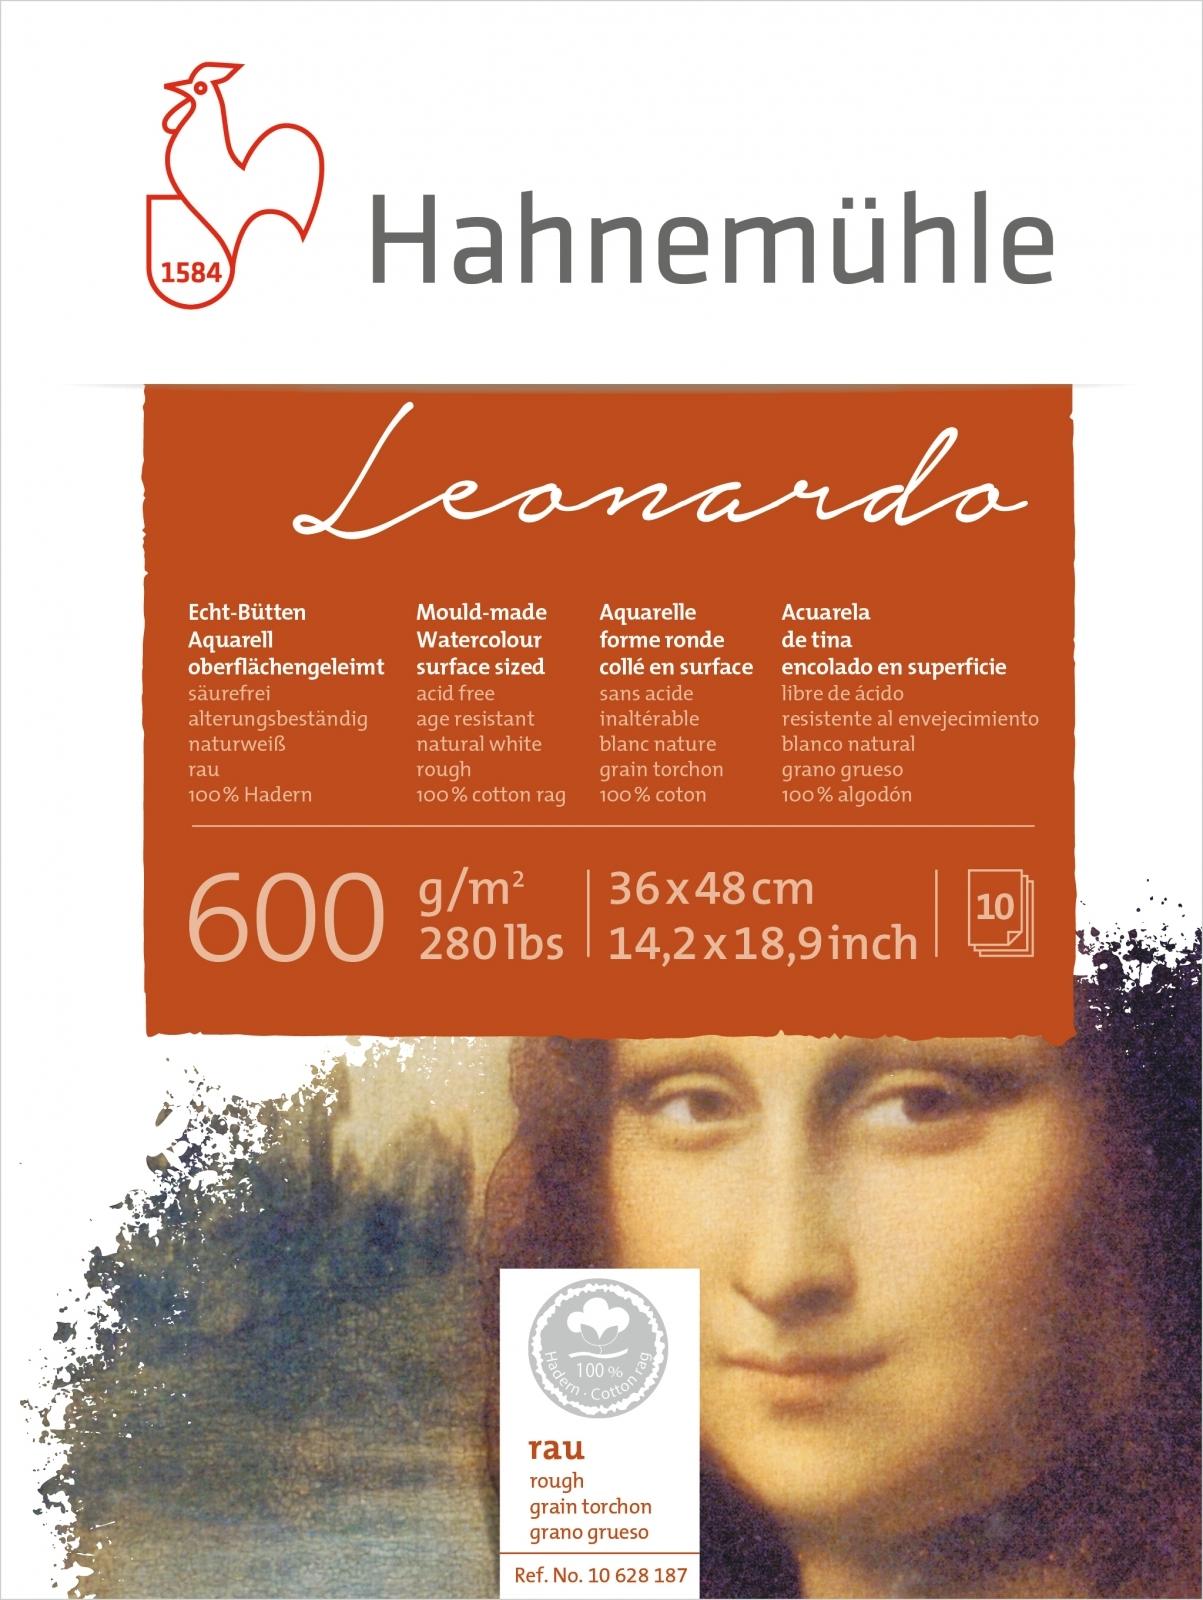 Papel Hahnemuhle Leonardo Textura Rugosa 600g/m2 36x48 10fls - Papelaria Botafogo